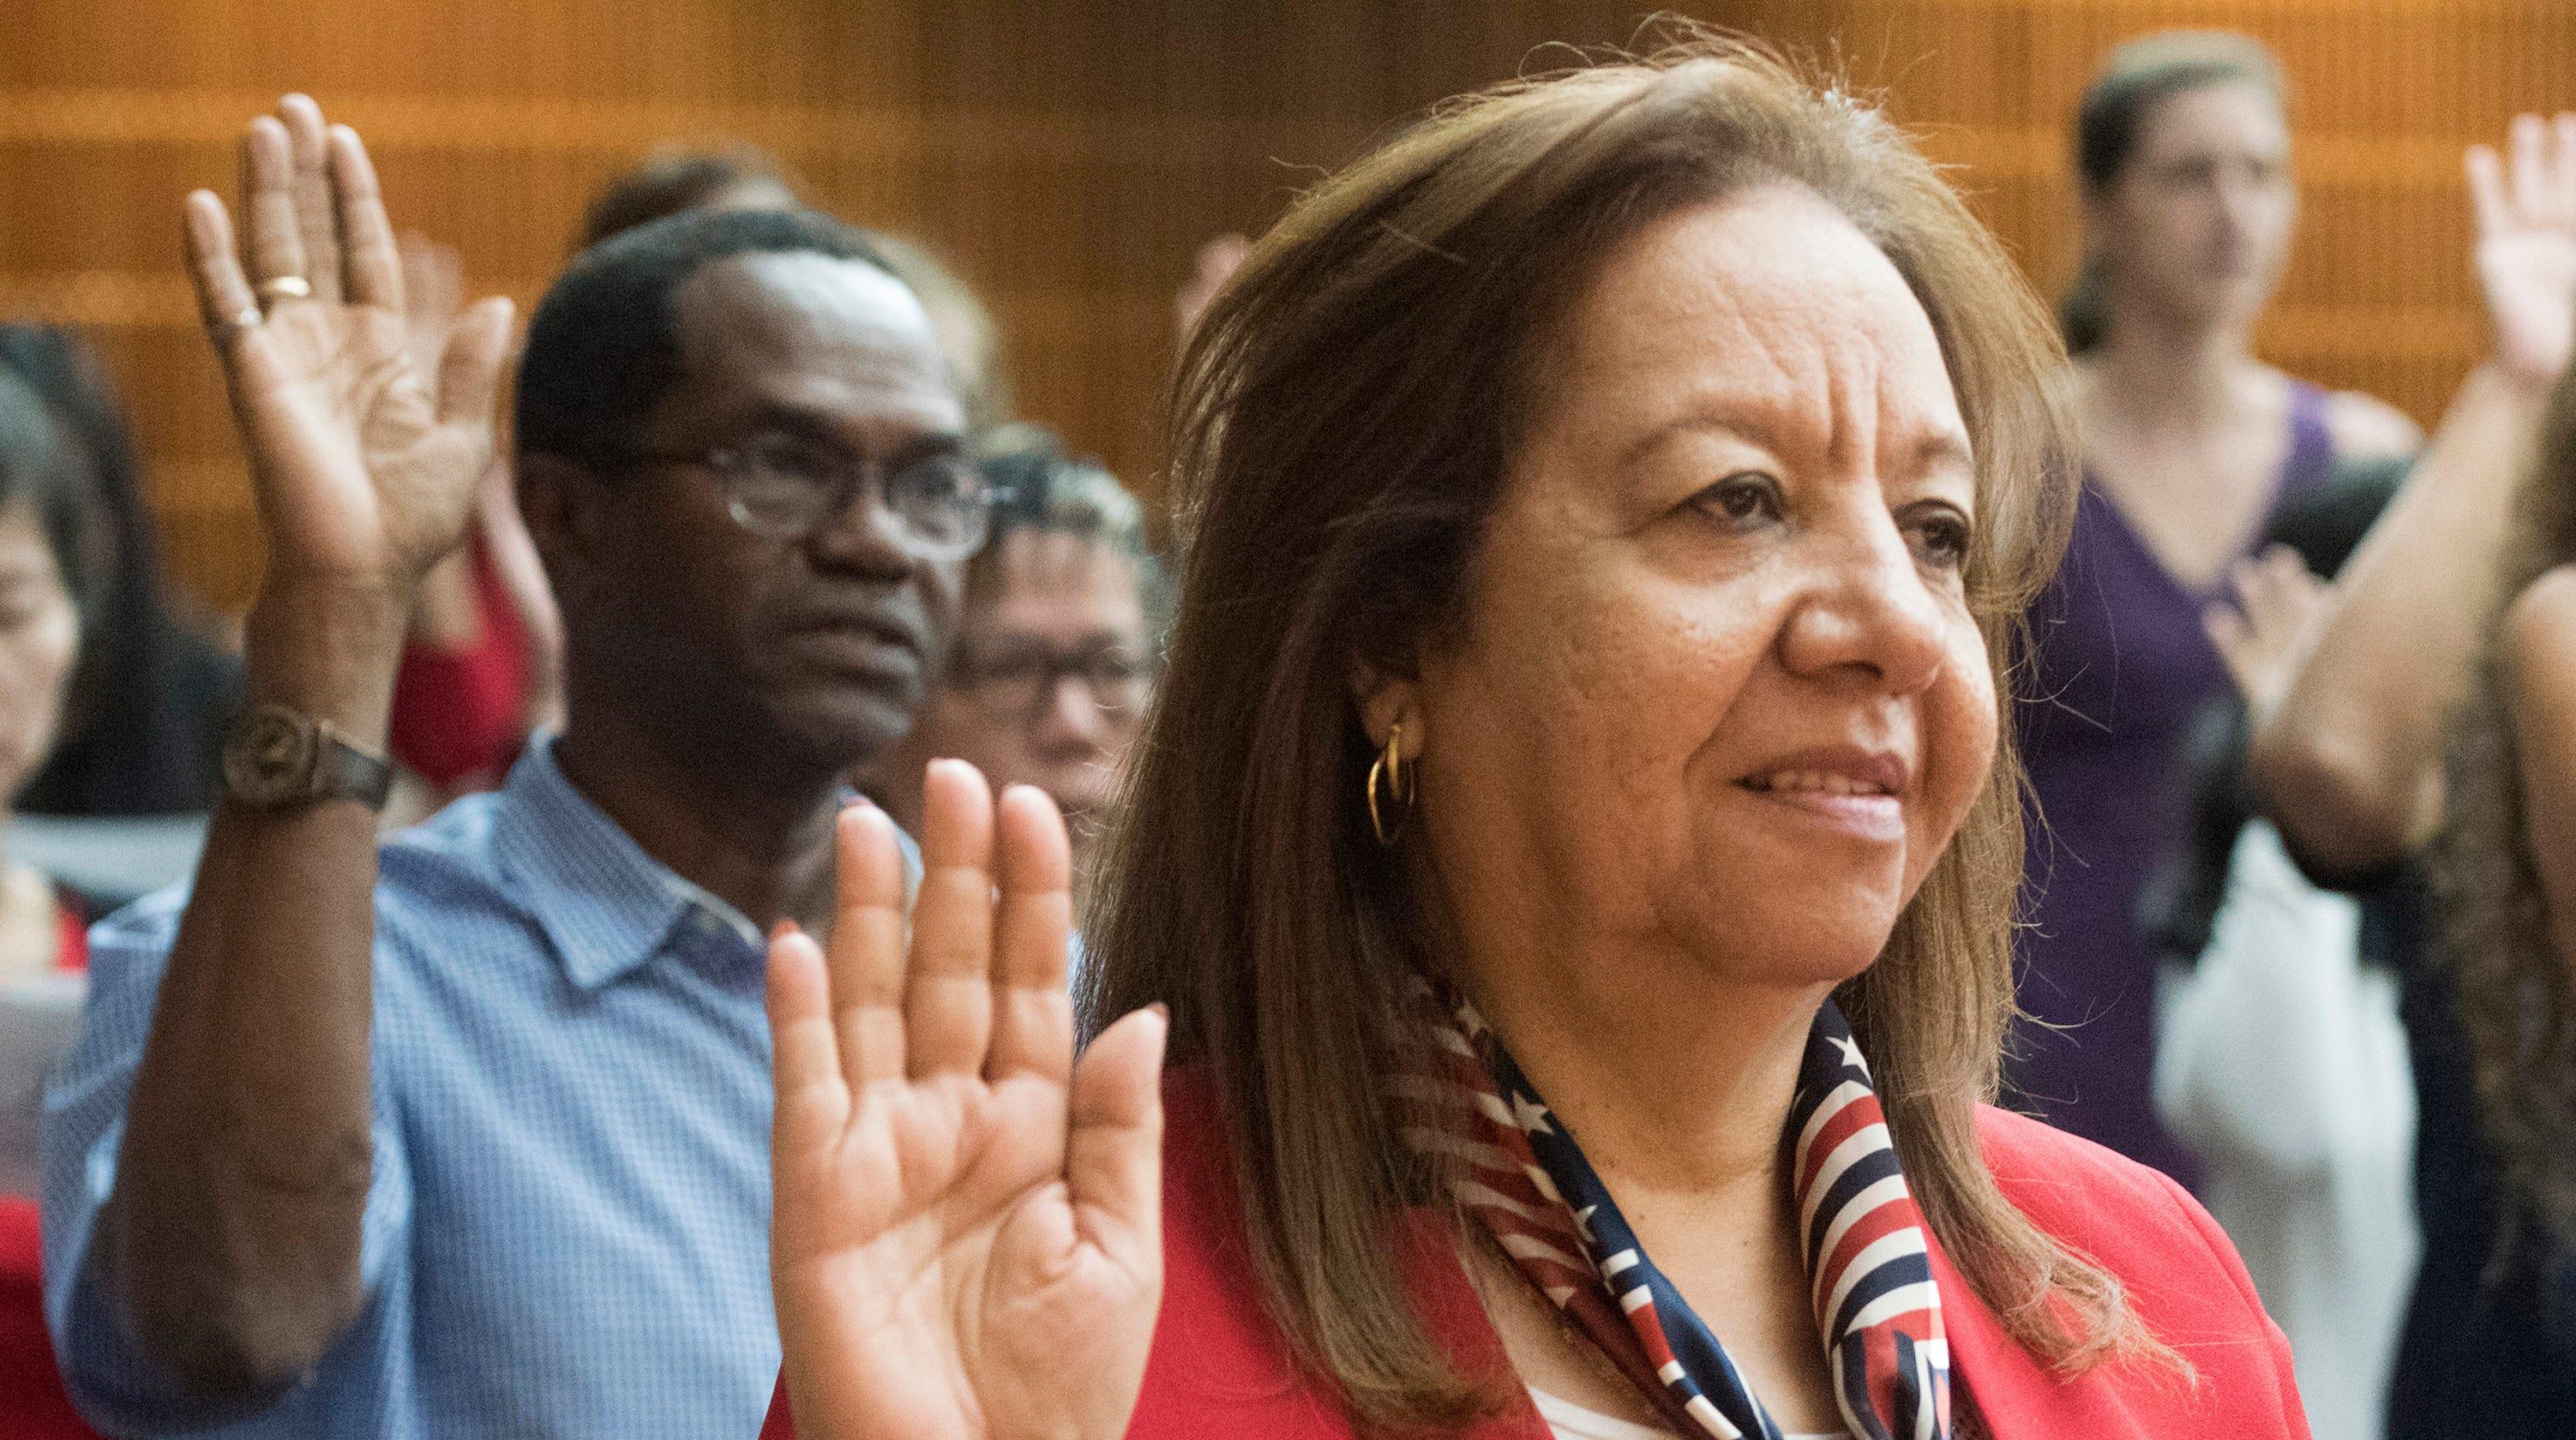 Pensacola naturalization ceremony shows America still land